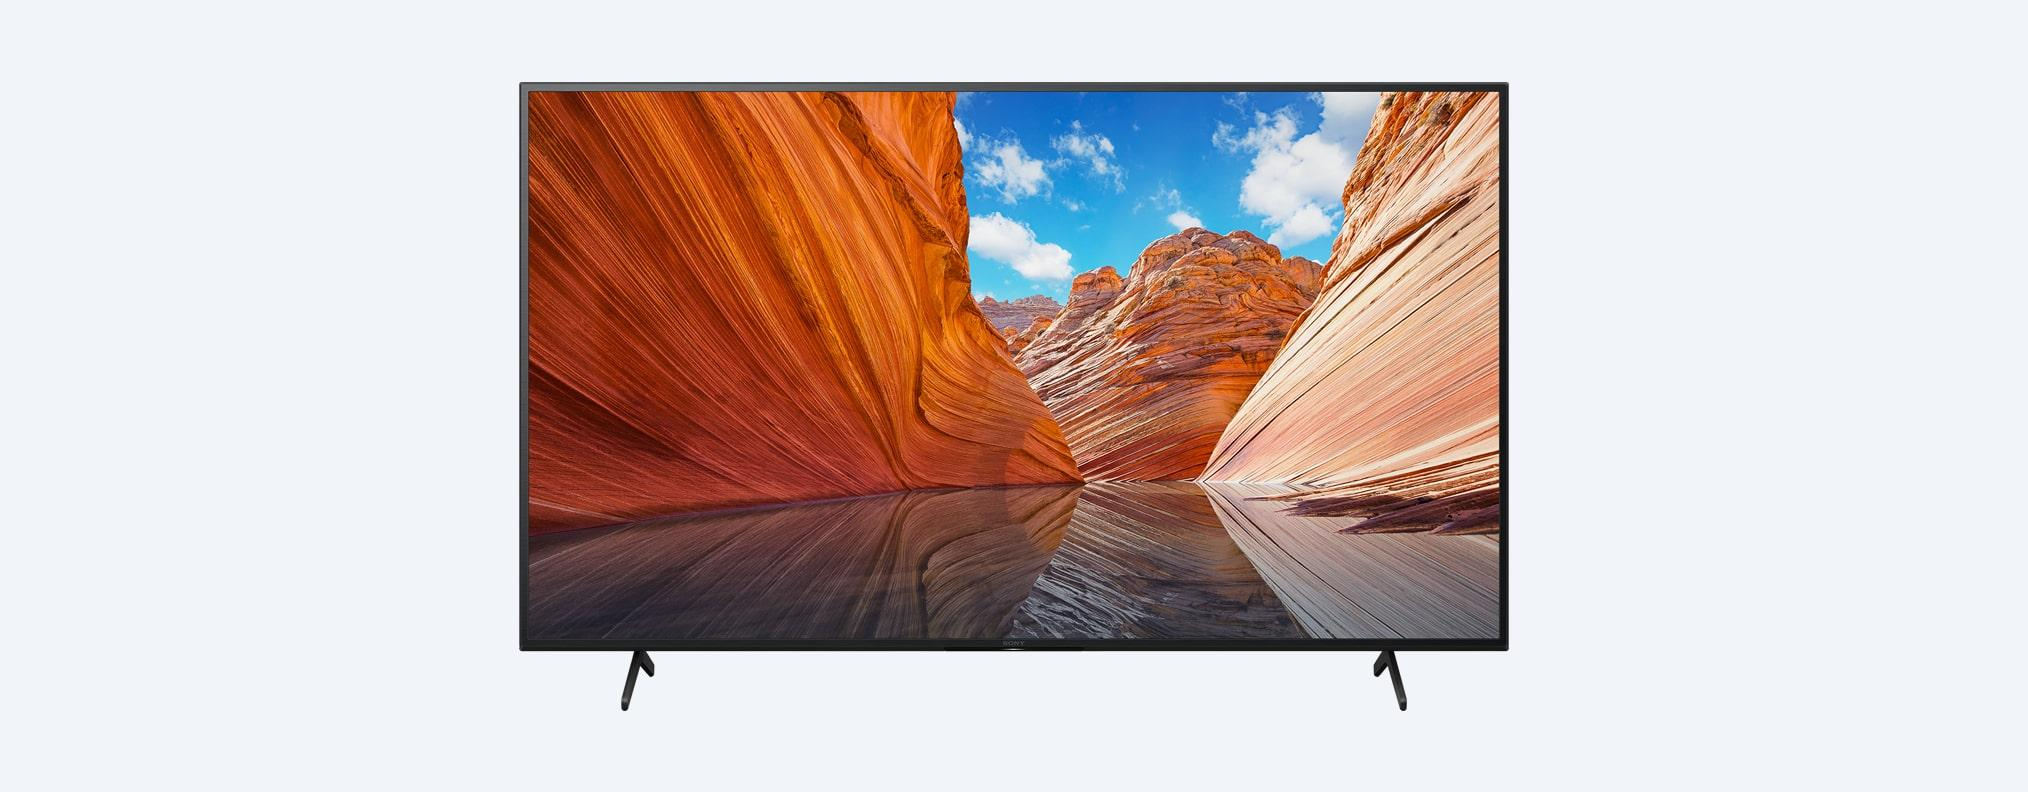 SonyX80j  4k Ultra Hd  High Dynamic Range (Hdr)  Smart Tv (Google Tv)